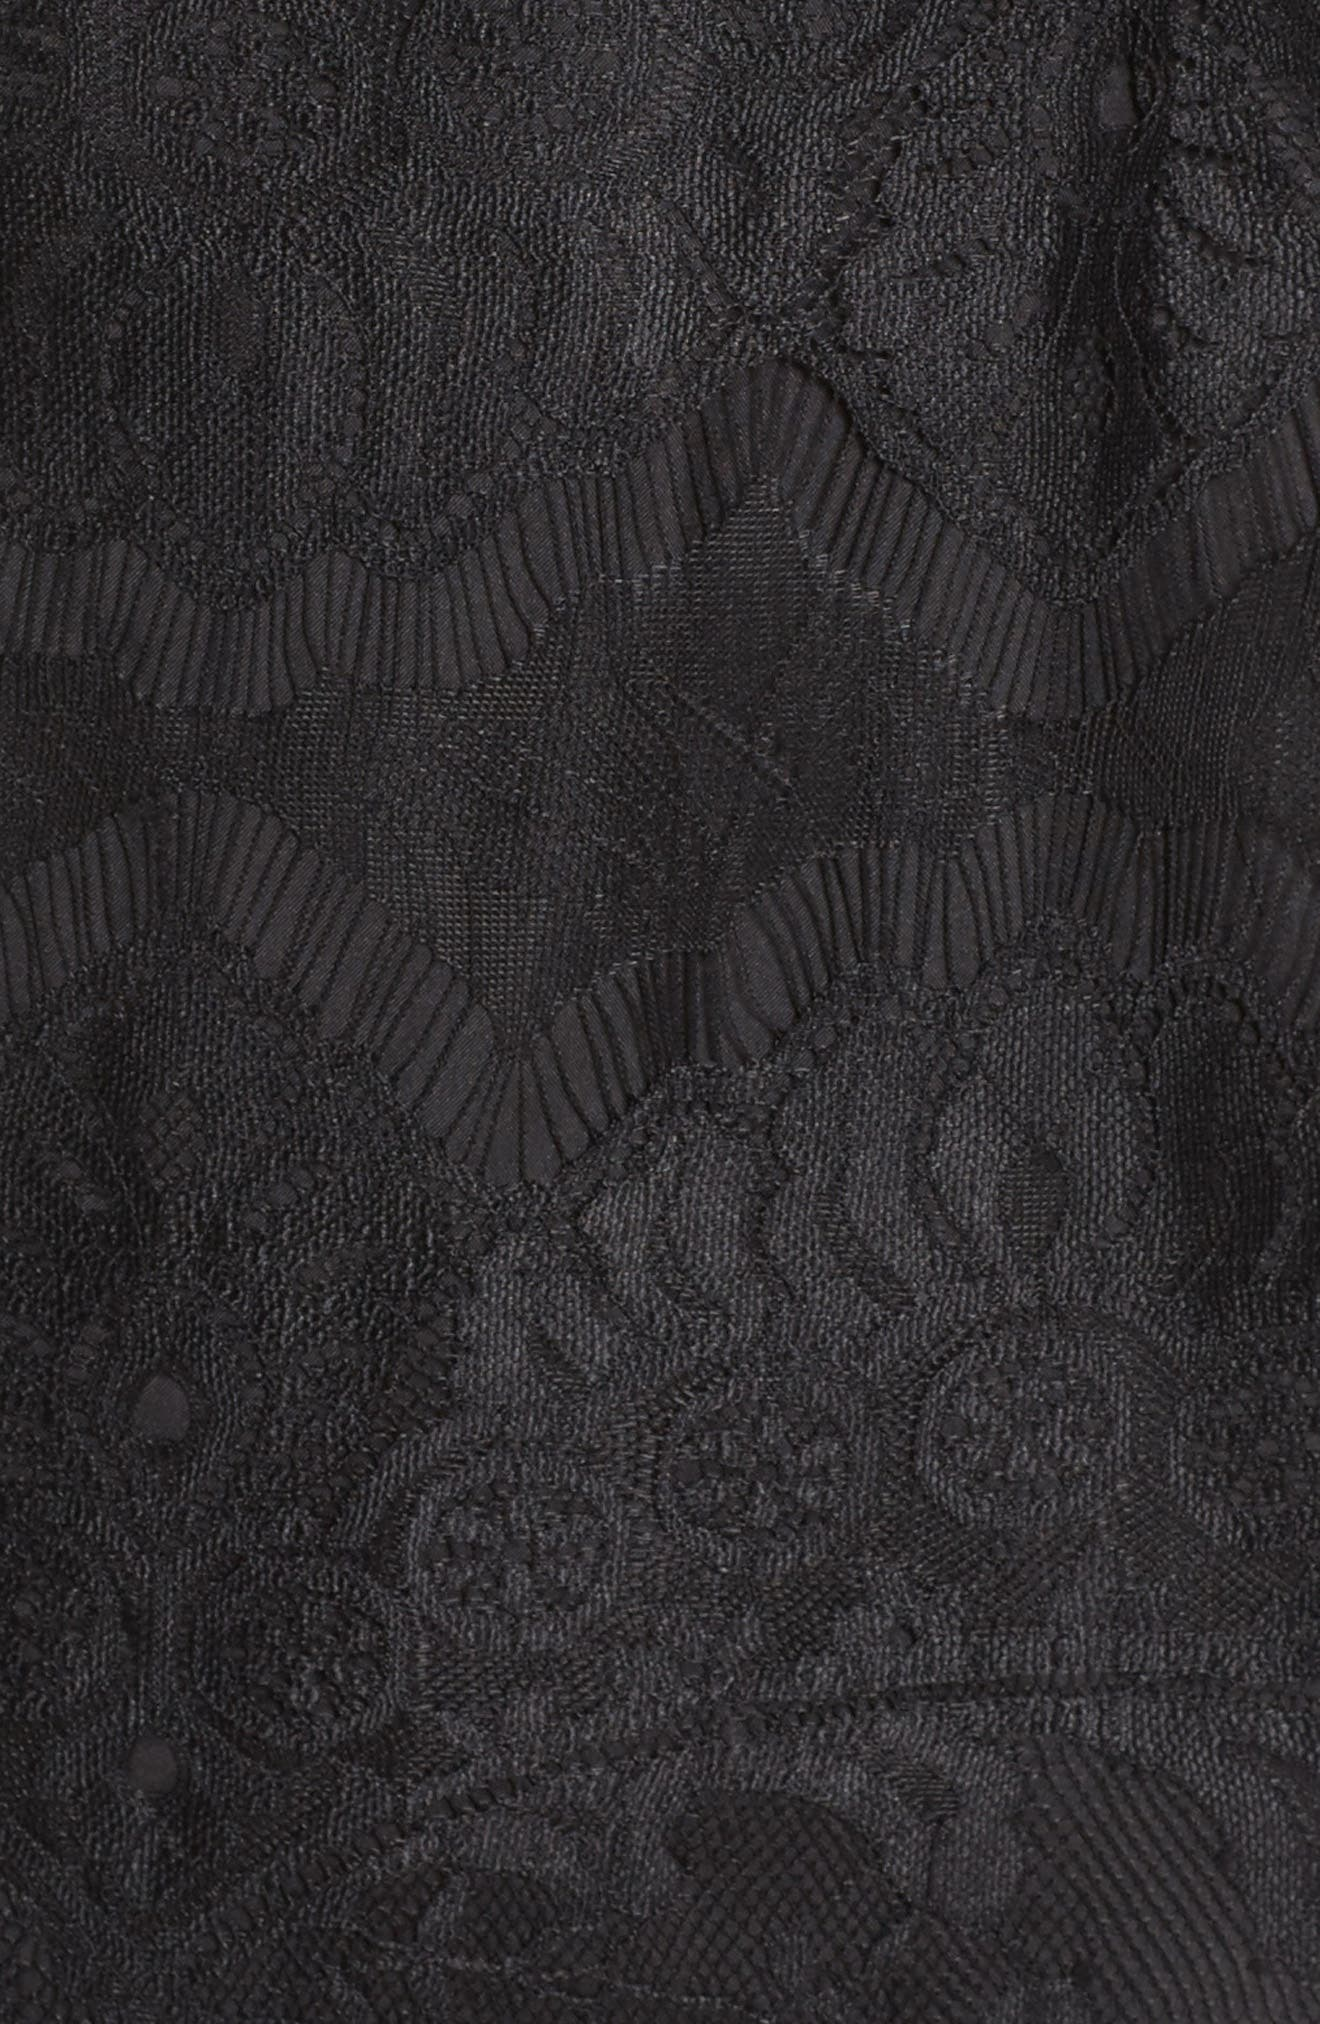 Jayce Lace Sheath Dress,                             Alternate thumbnail 5, color,                             BLACK